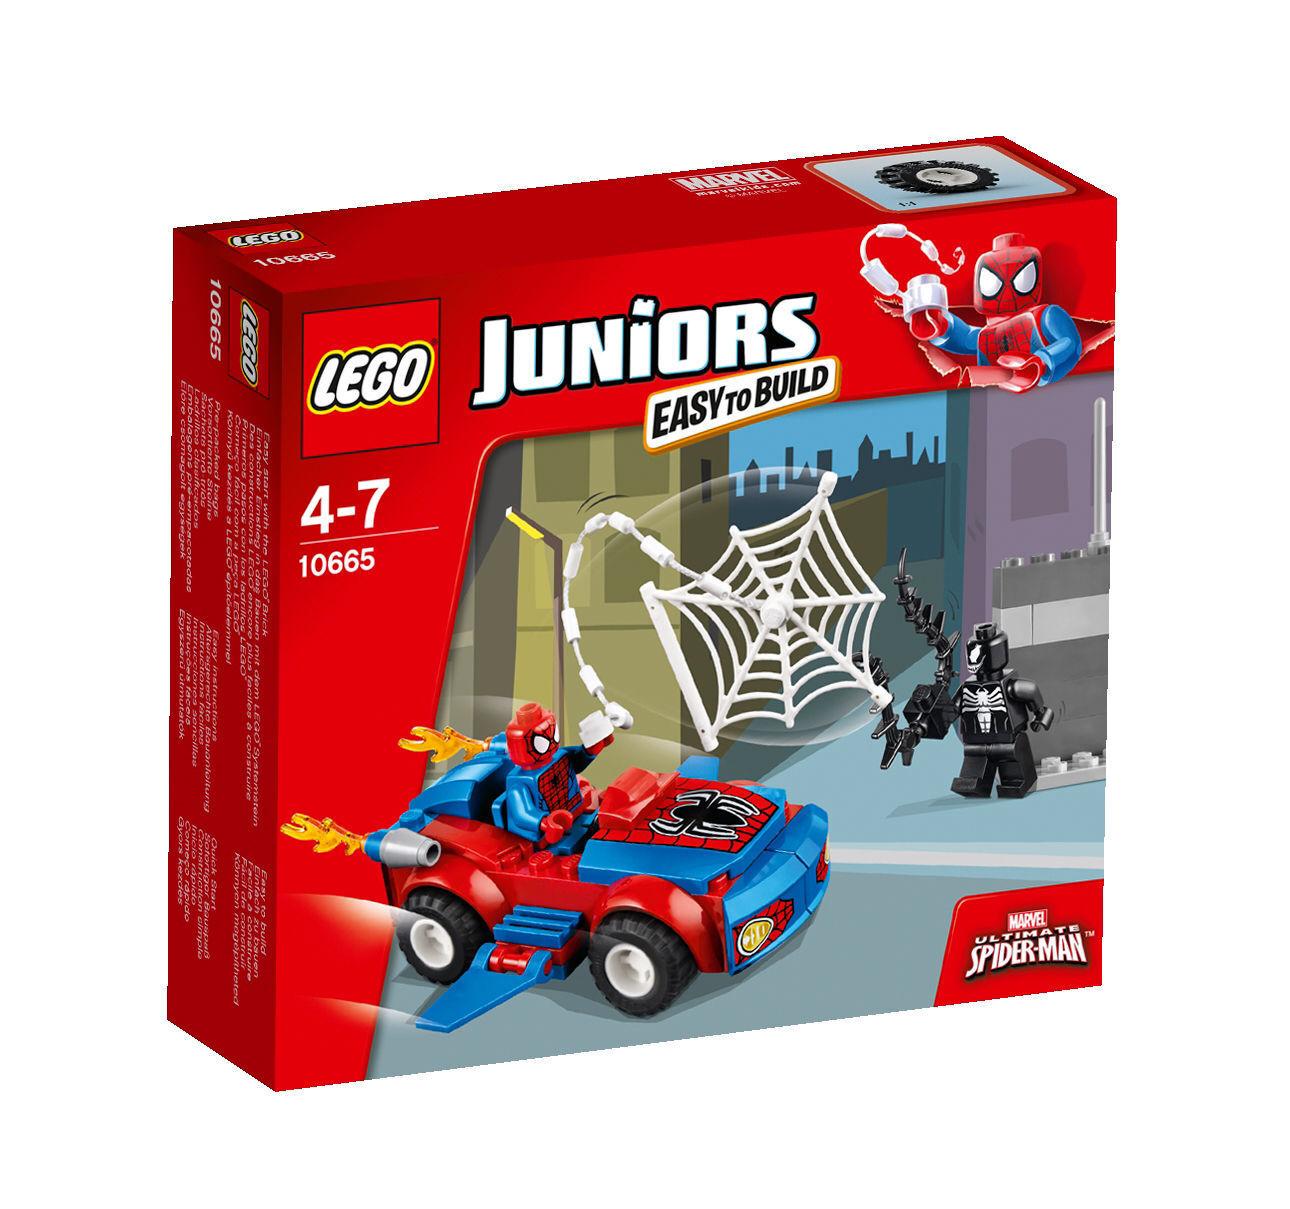 LEGO ® Juniors Spider-Man Spider-Car persécution (10665)